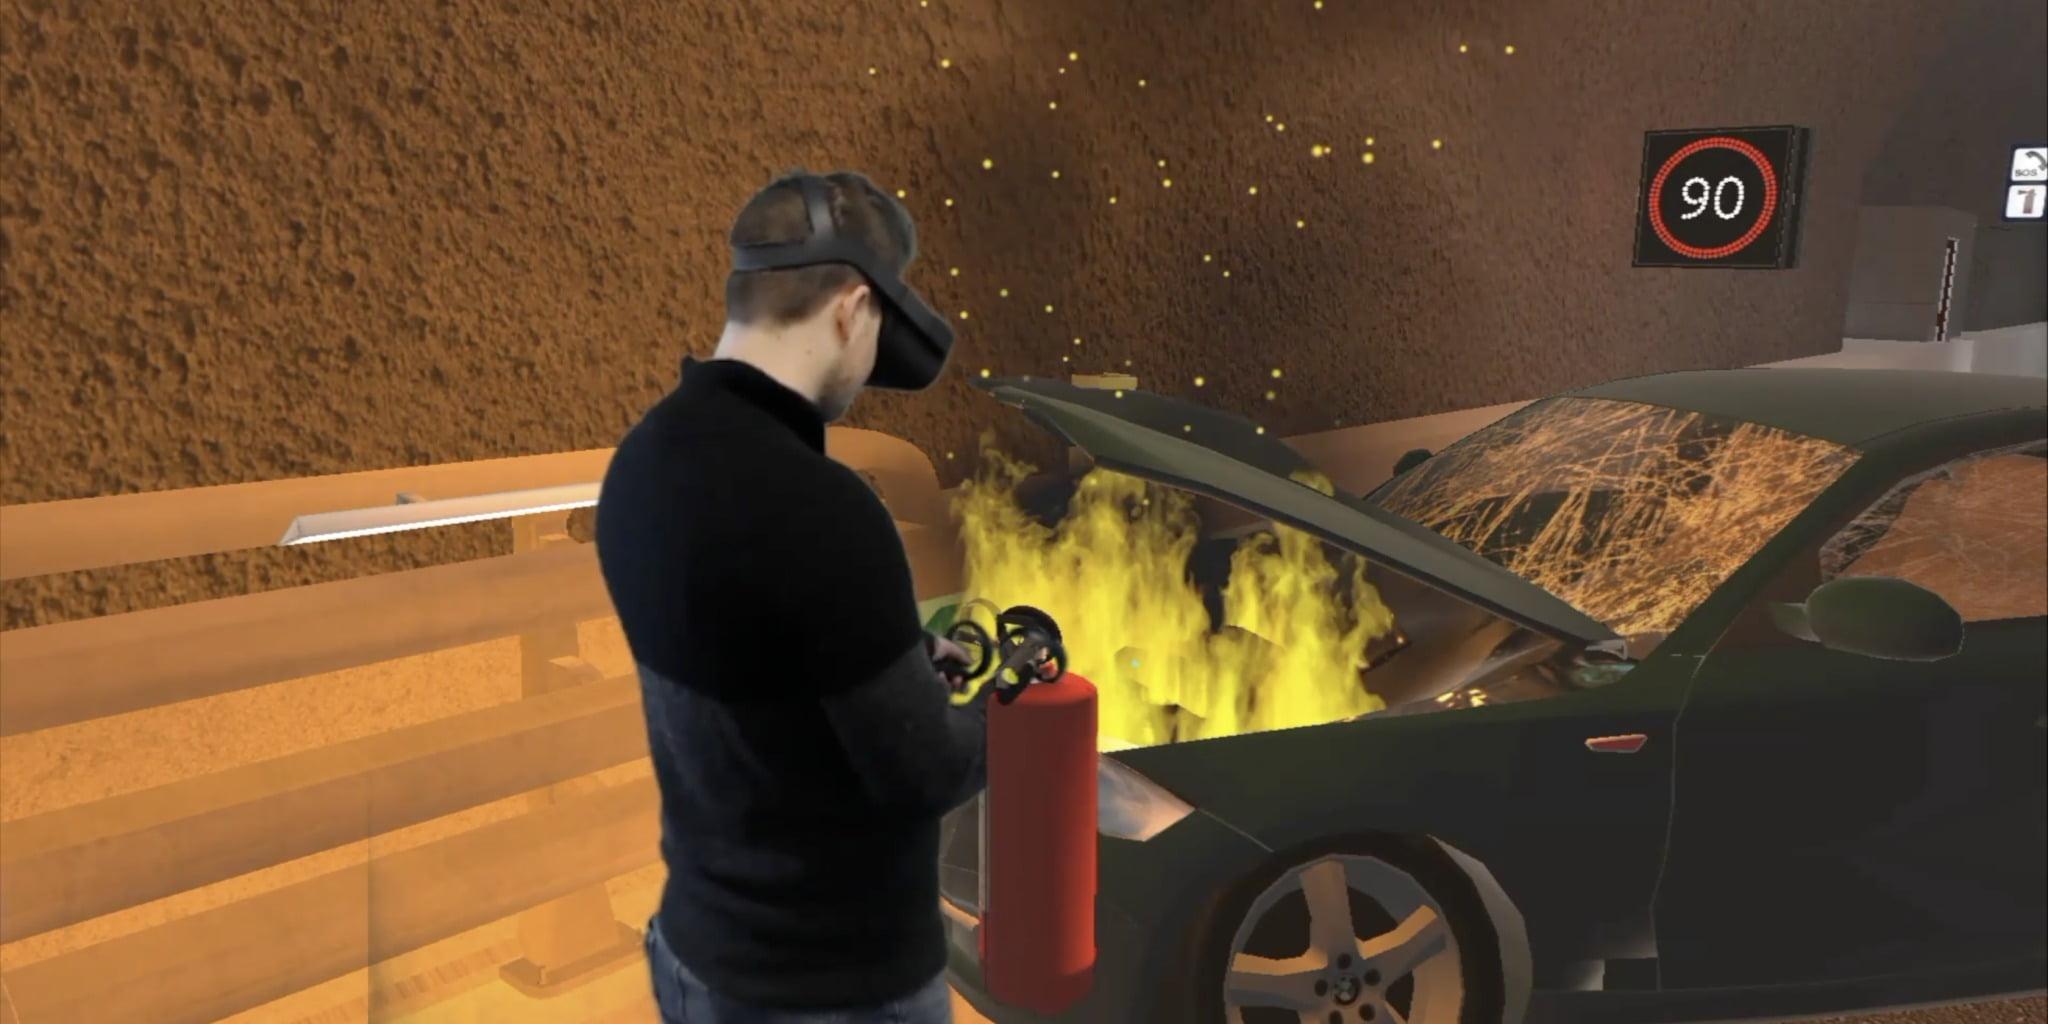 Automotive wheel system, Baseball cap, Rim